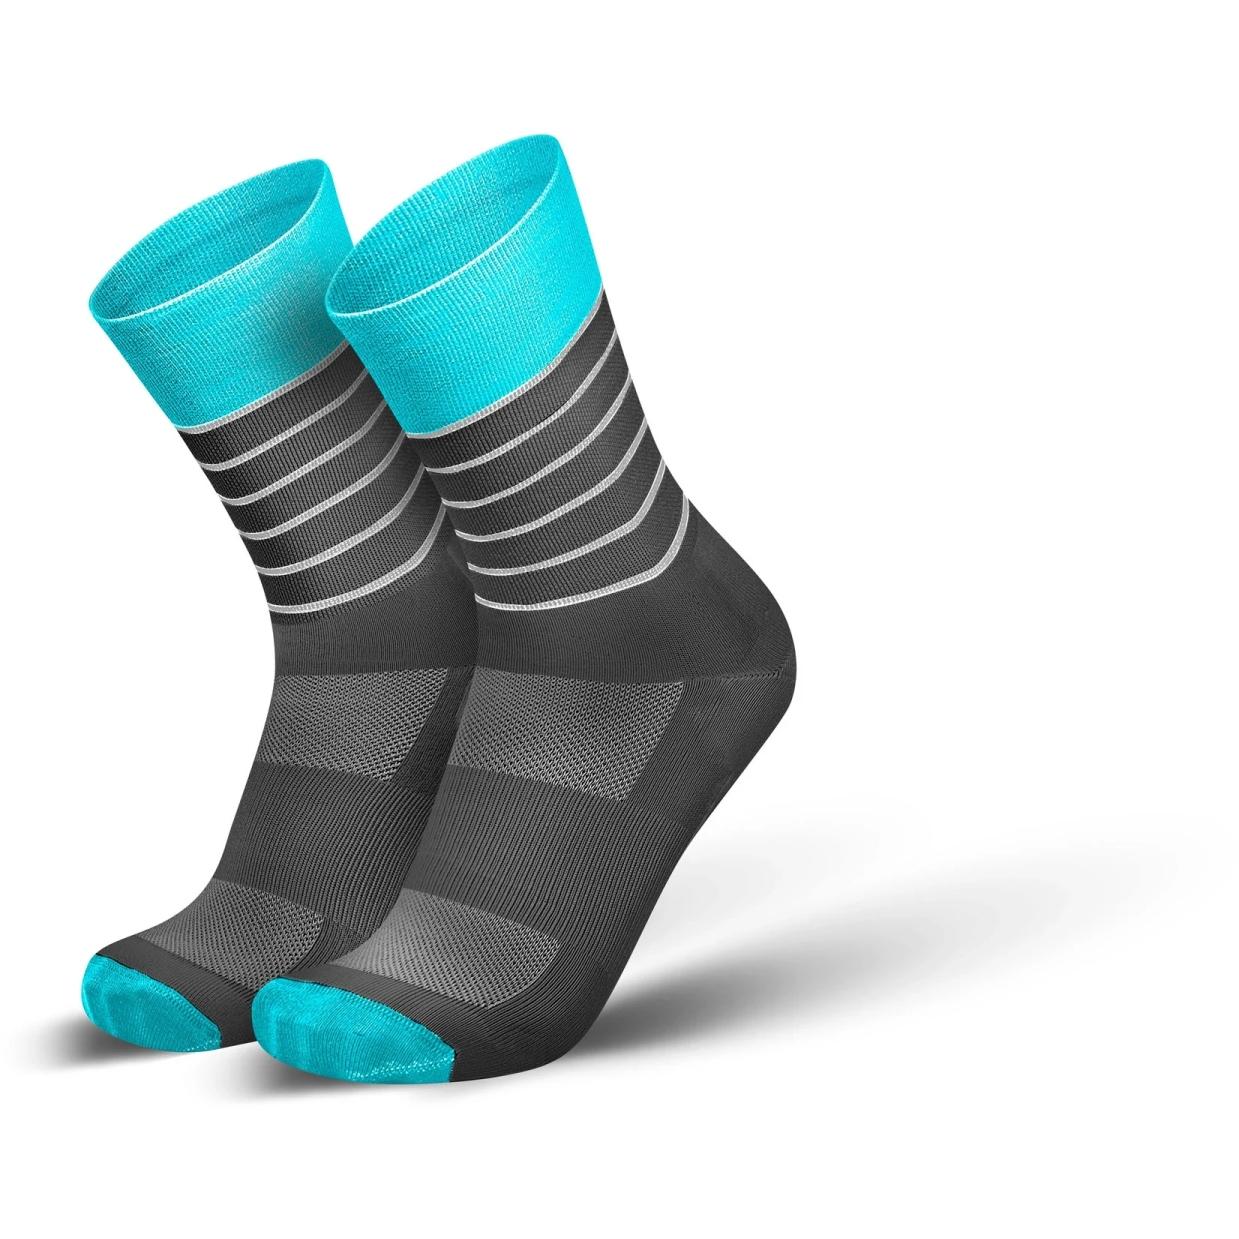 Produktbild von INCYLENCE Ultralight Stripes Socken - Cyan